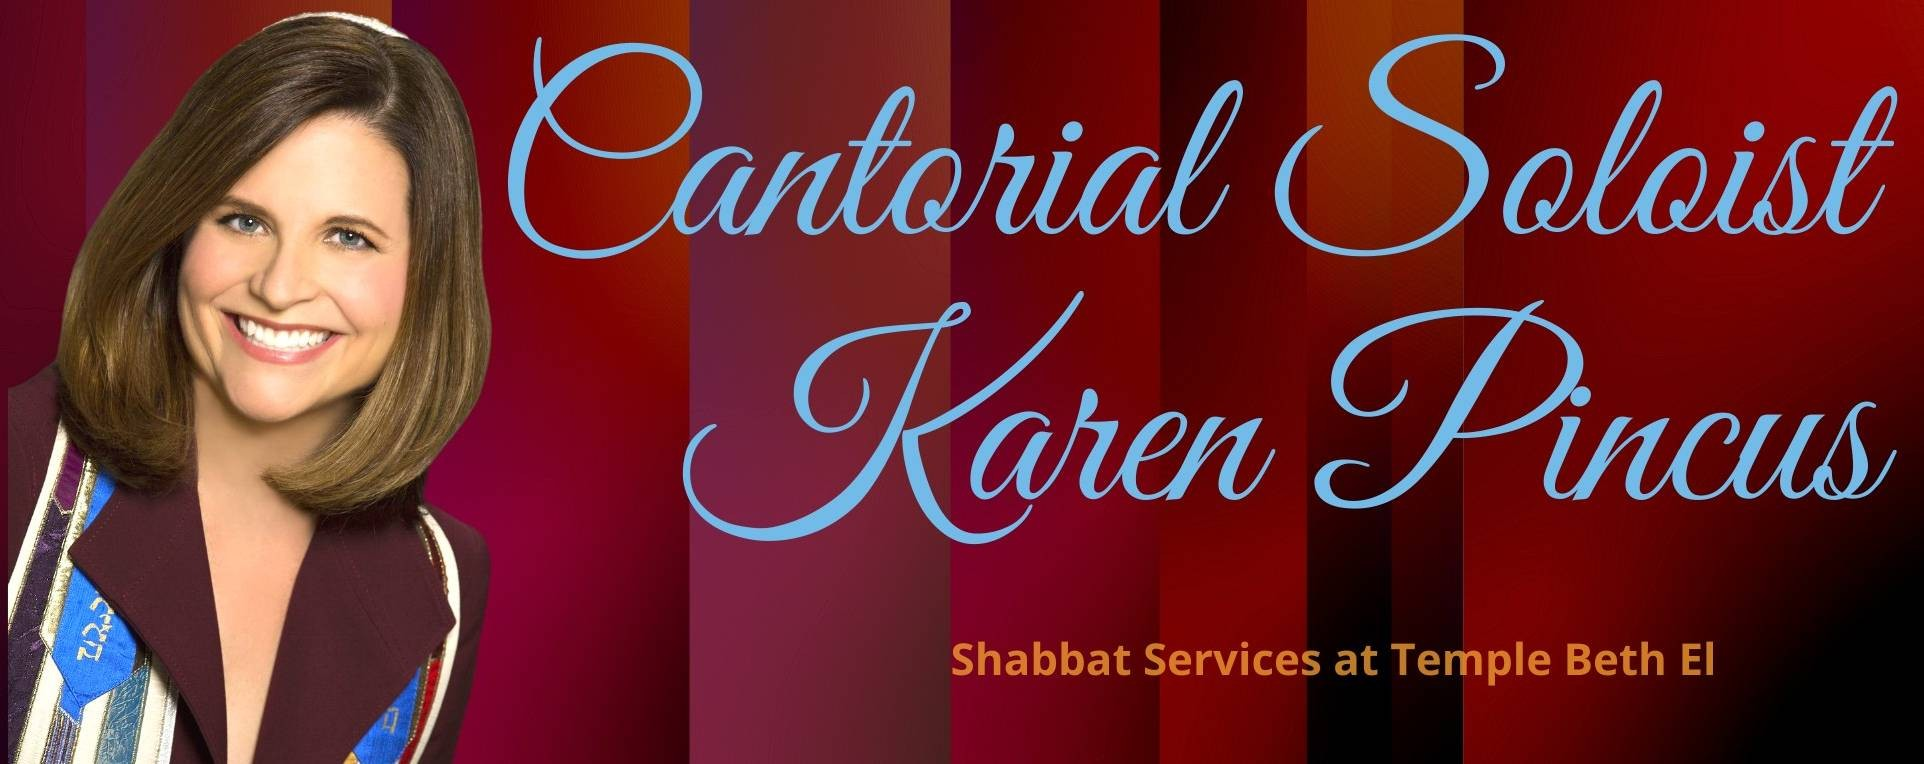 "<a href=""https://www.templebethel.com/event/erev-shabbat-services-guest-cantorial-soloist-karen-pincus-on-line--in-person.html""                                     target="""">                                                                 <span class=""slider_title"">                                     November 19th                                </span>                                                                 </a>                                                                                                                                                                                      <a href=""https://www.templebethel.com/event/erev-shabbat-services-guest-cantorial-soloist-karen-pincus-on-line--in-person.html"" class=""slider_link""                             target="""">                             More Information                            </a>"